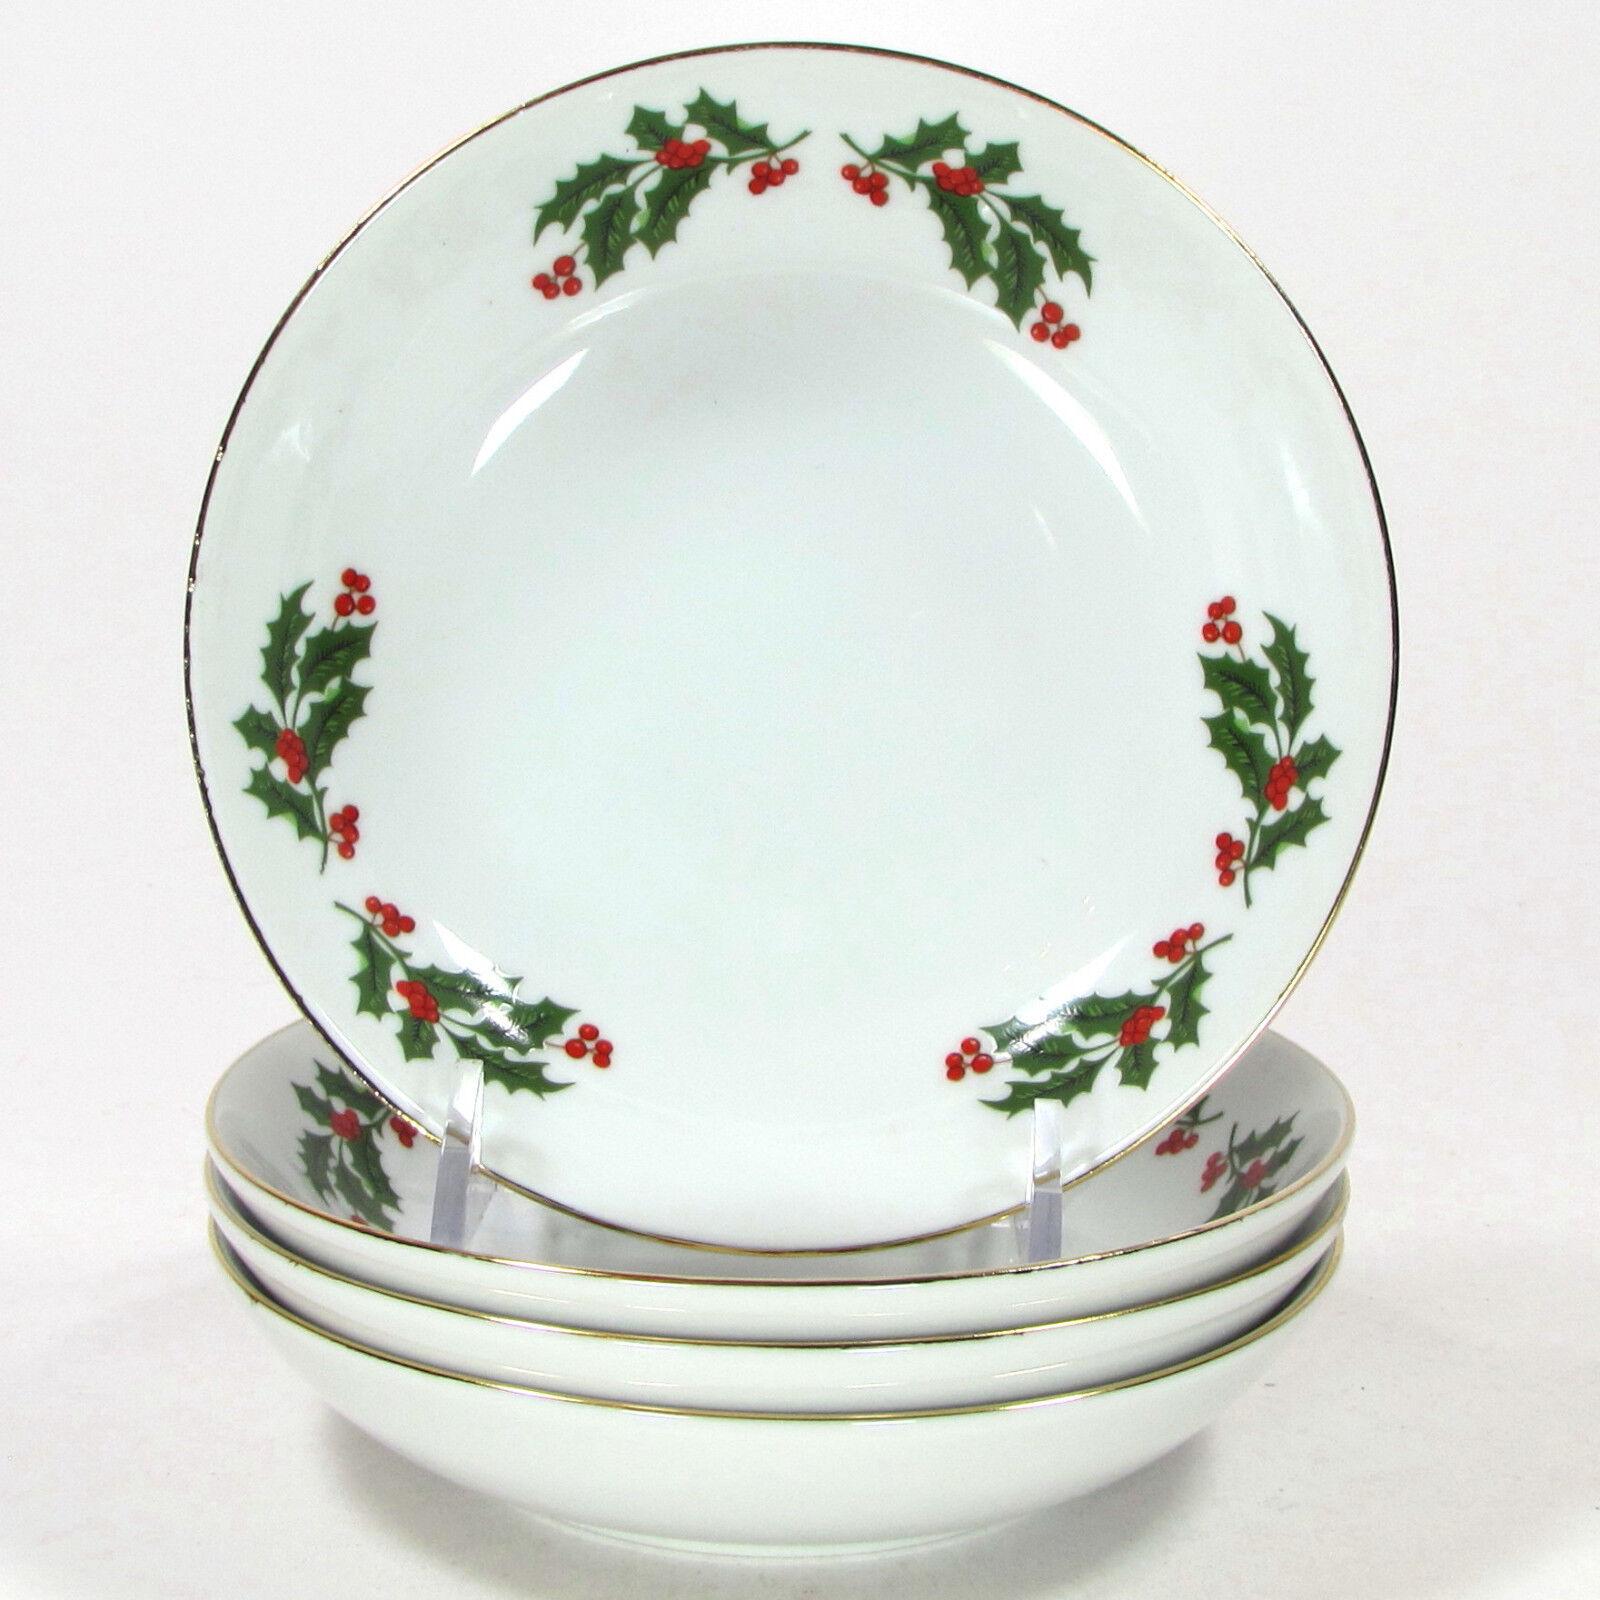 Kashima CHRISTMAS HOLLY 5.5 5.5 5.5  Bowl Set 4Pc Japan Weiß Gold Trim Porcelain NIB 9002dc